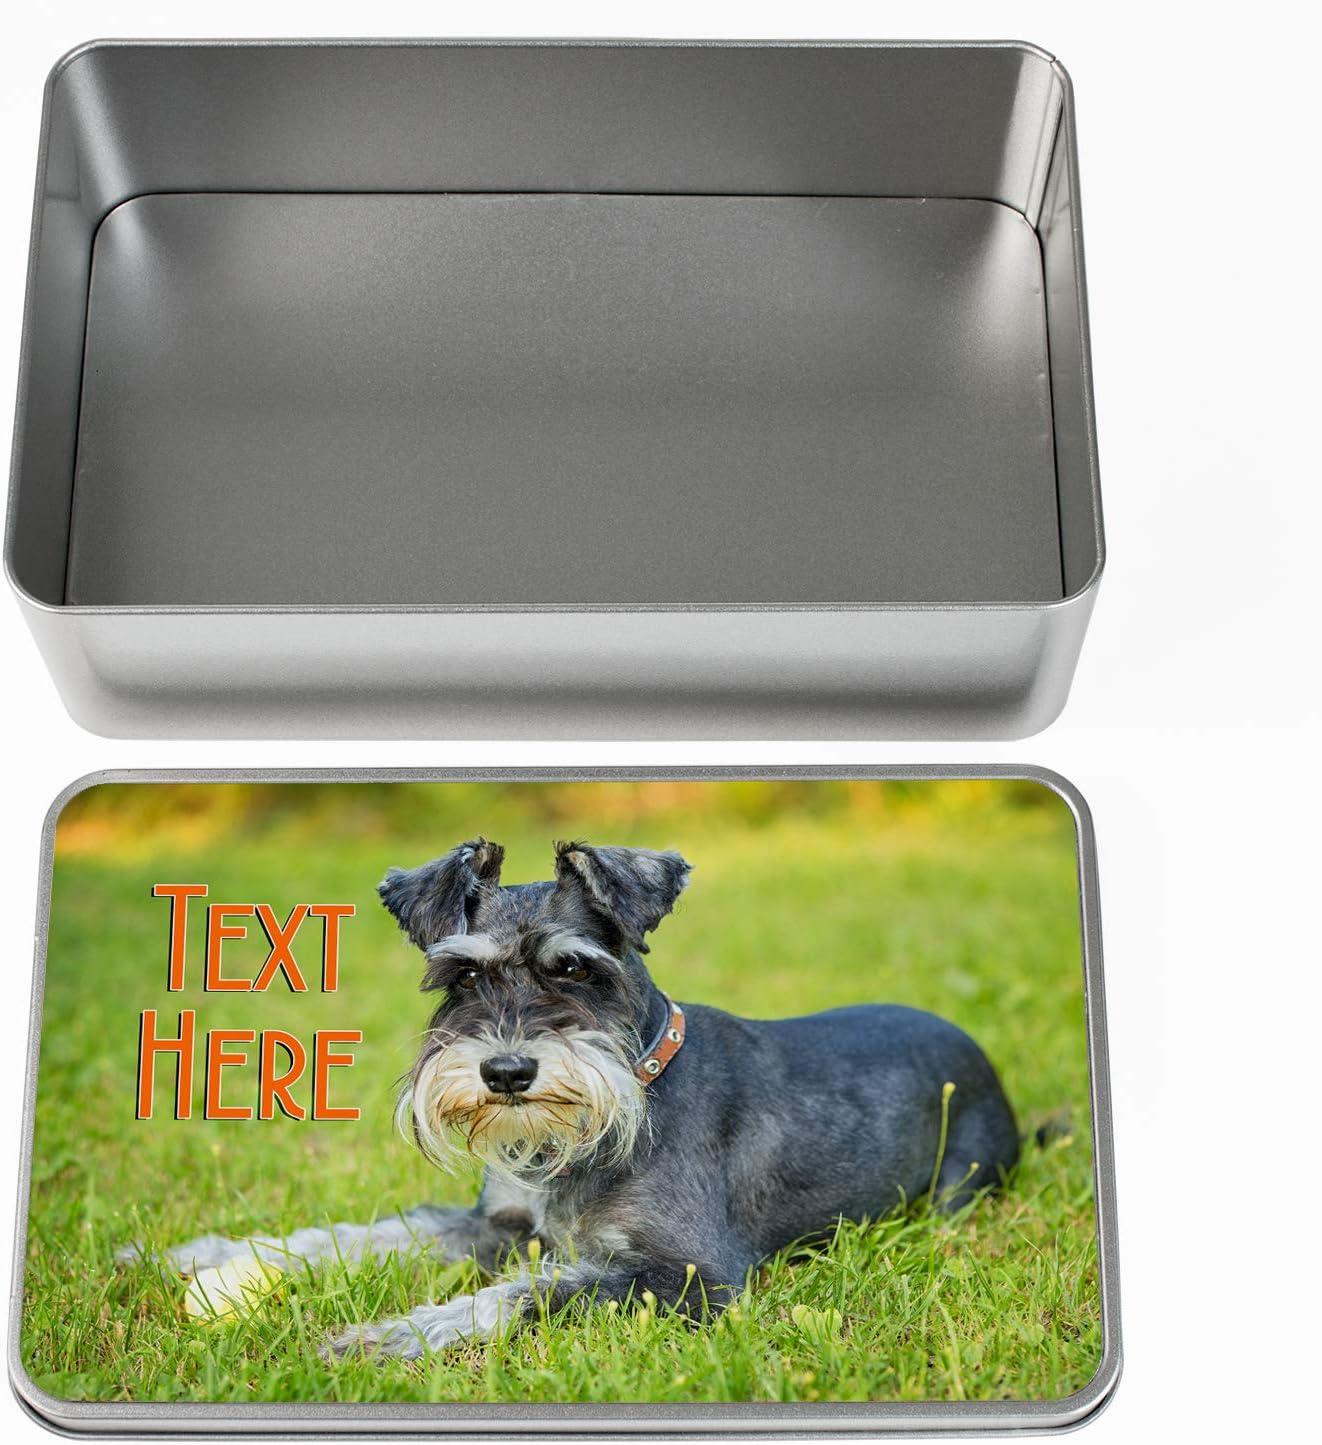 KRAFTYGIFTS KS171 - Caja de Lata para Comida de Perro: Amazon.es: Hogar